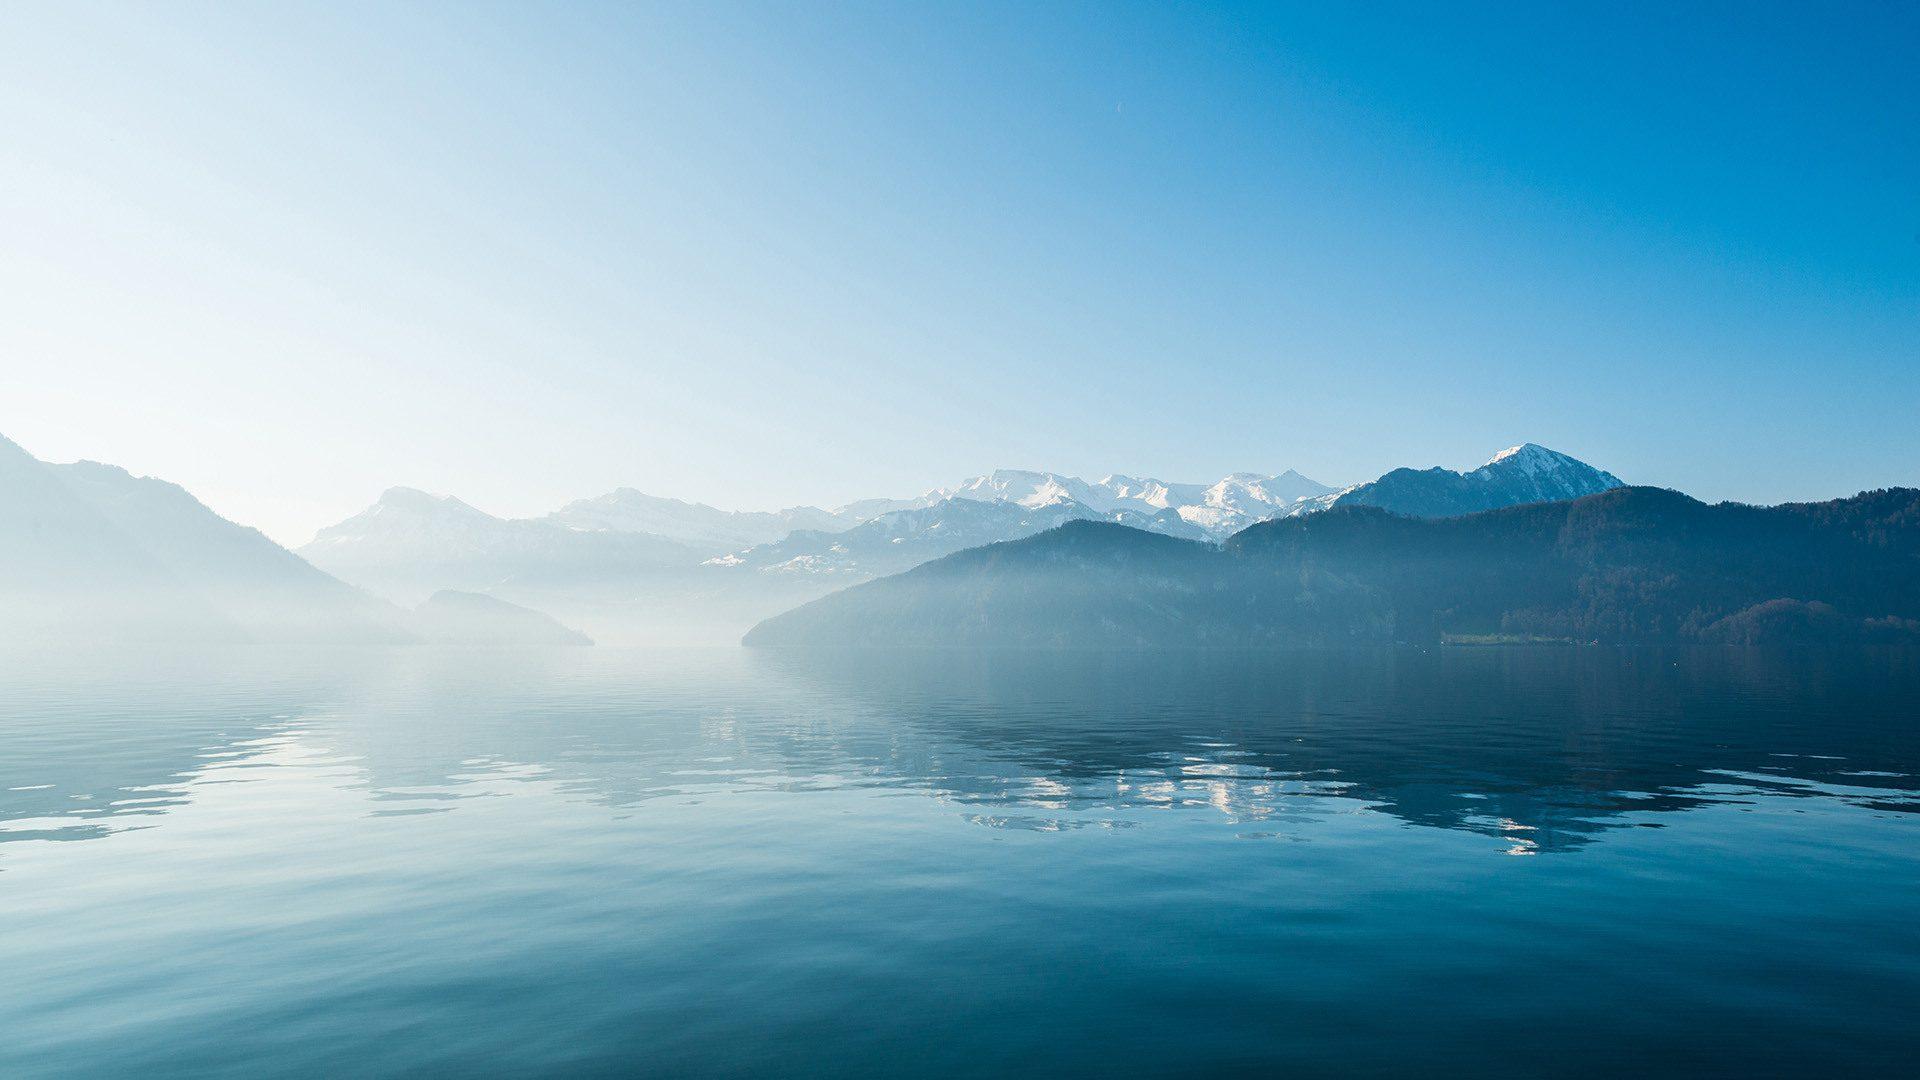 Chenot_weggis_Lake-Lucerne_1920x1080.jpg